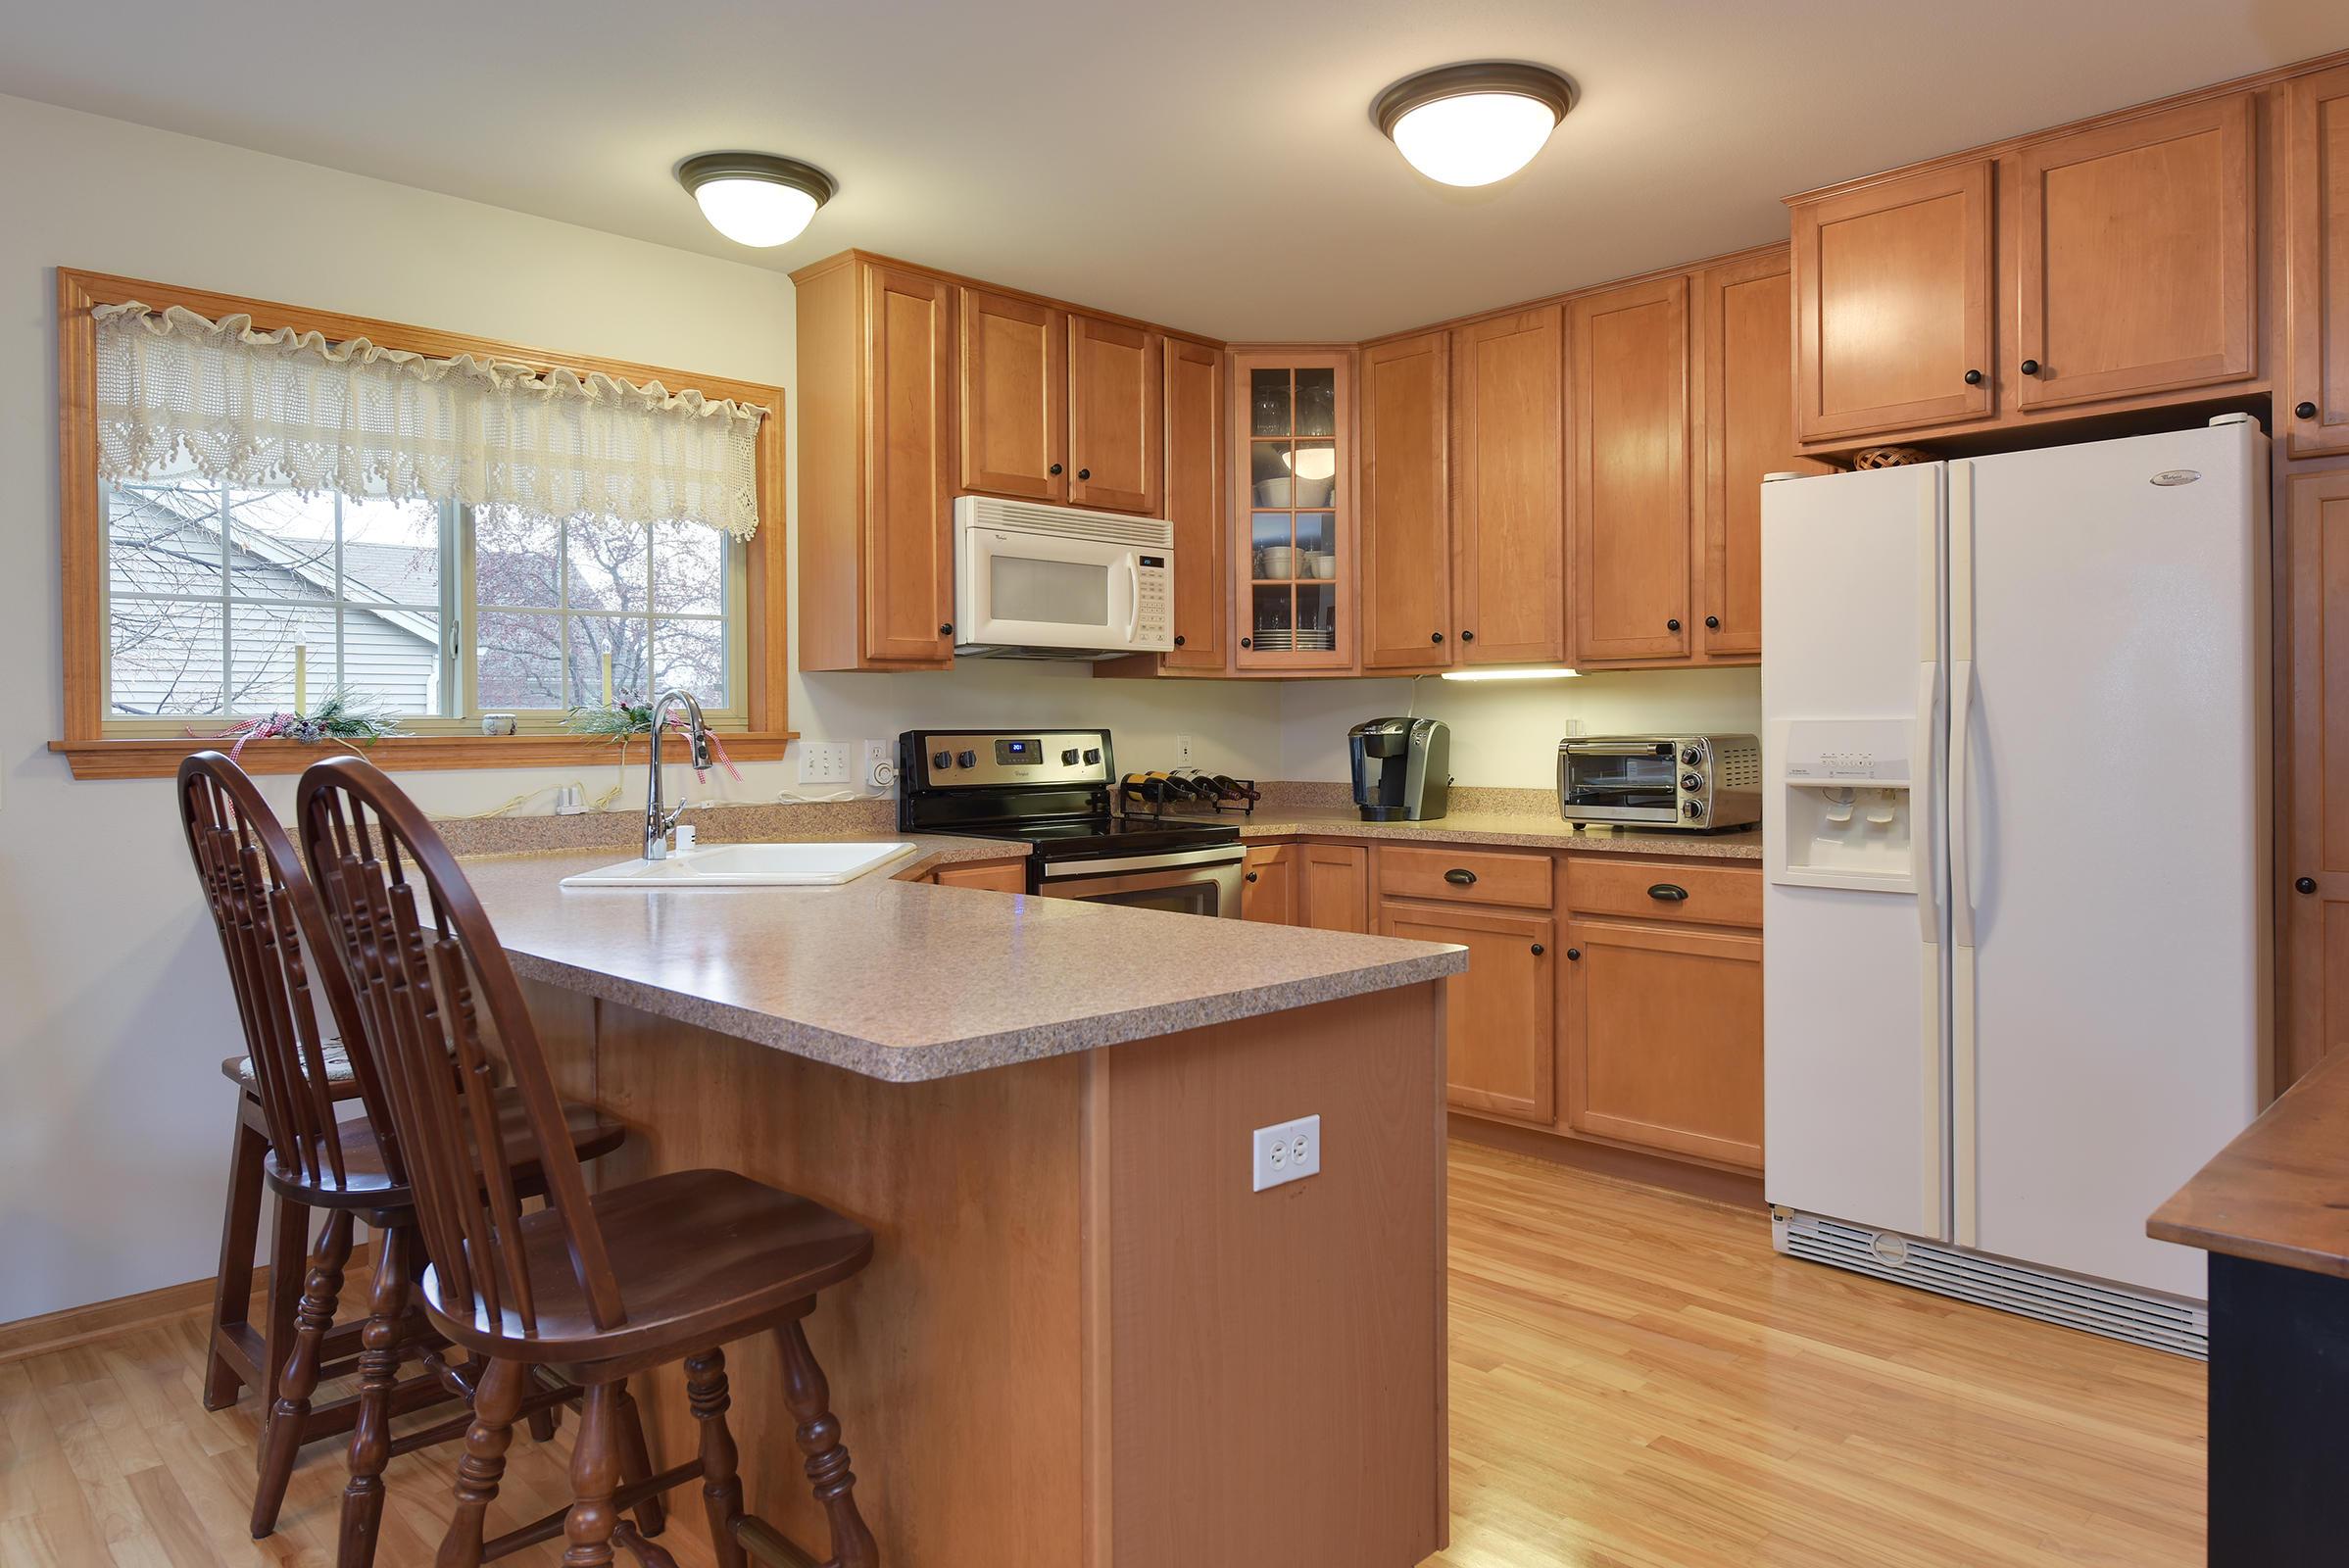 1132 Oriole Dr, Oconomowoc, Wisconsin 53066, 3 Bedrooms Bedrooms, 7 Rooms Rooms,2 BathroomsBathrooms,Single-Family,For Sale,Oriole Dr,1617573